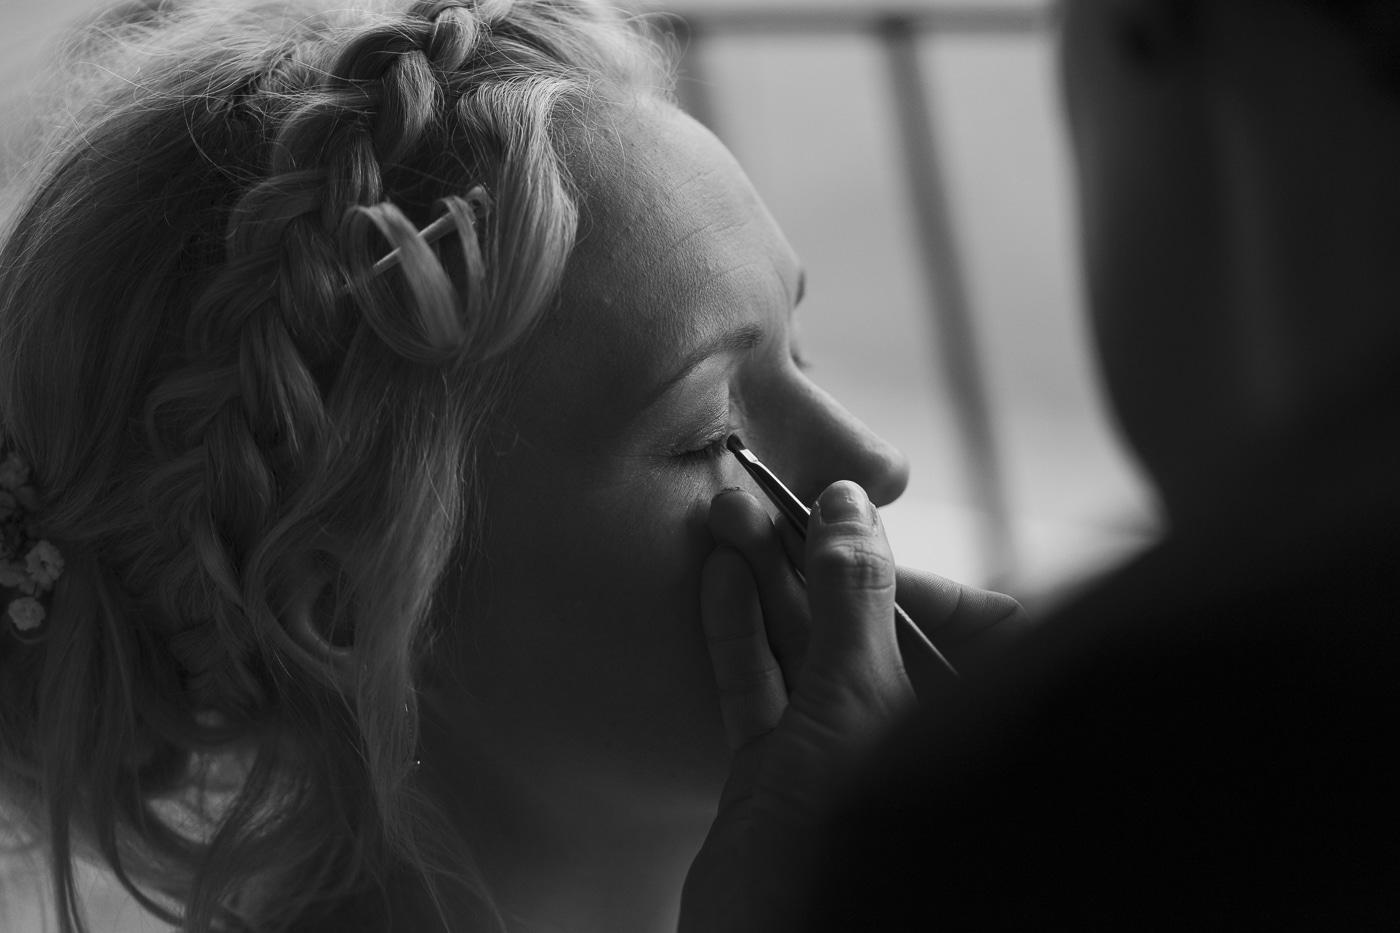 Bride with braid in hair gets eye makeup done